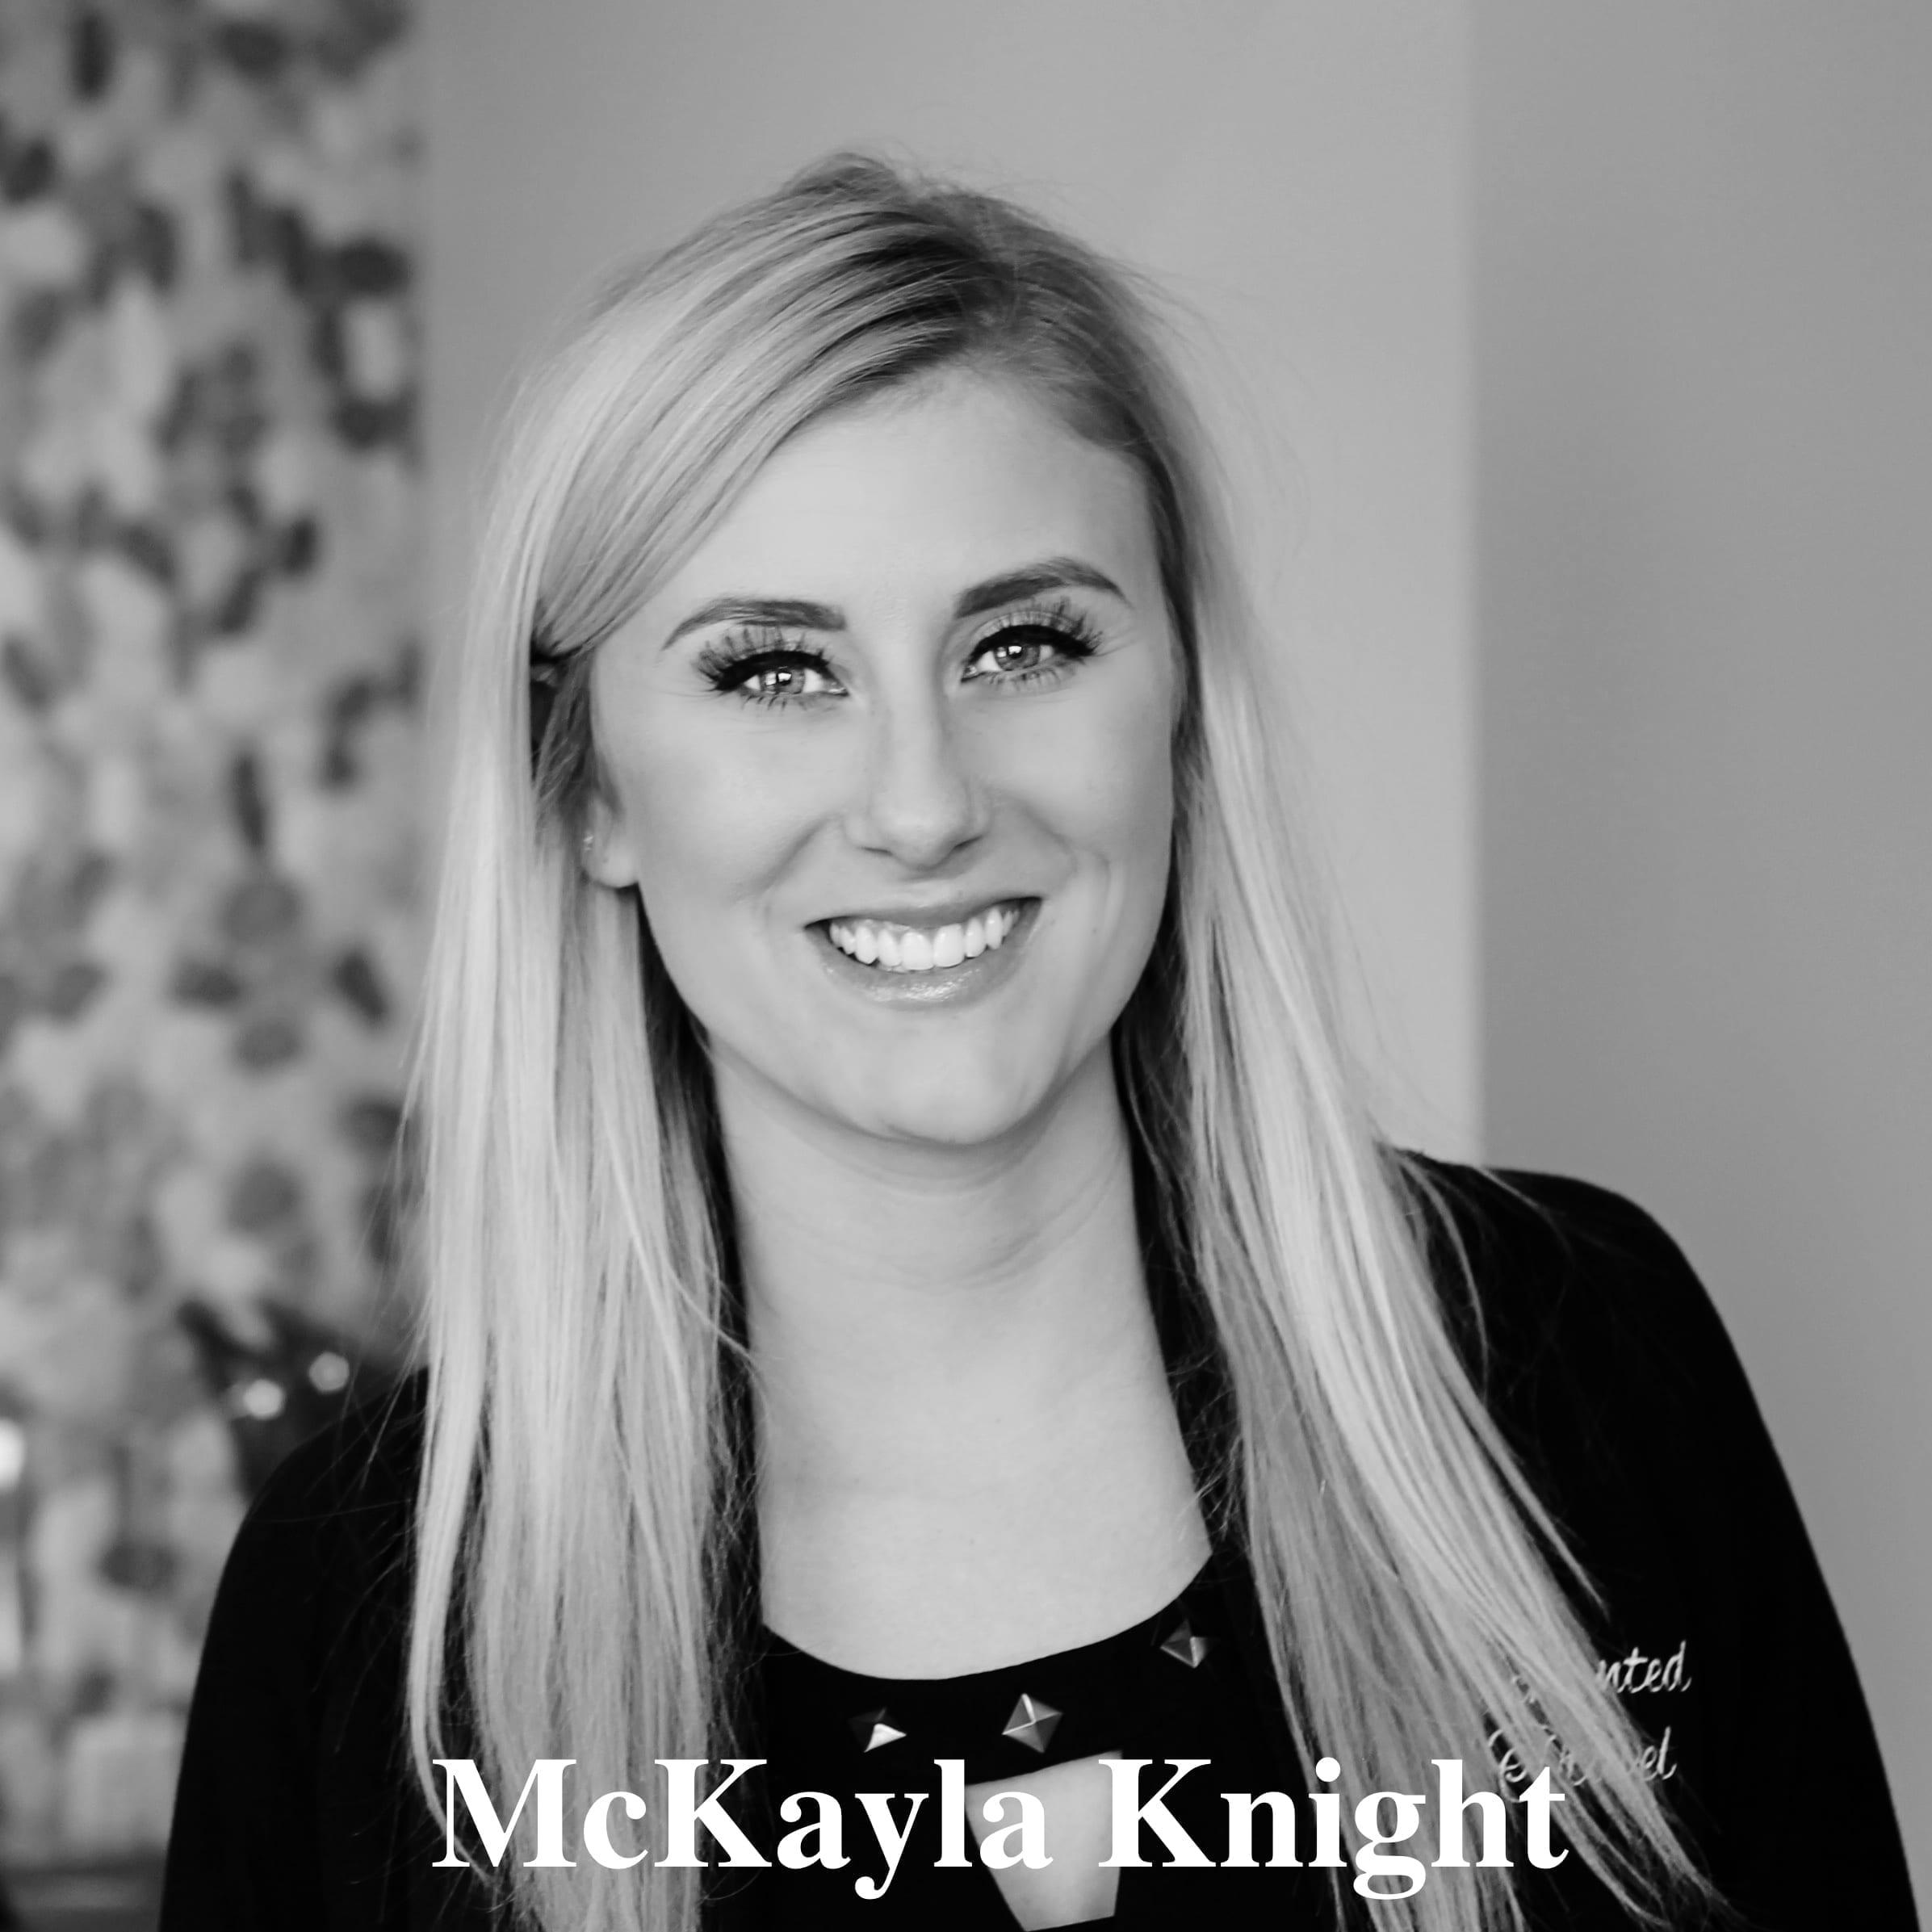 Mckayla Knight